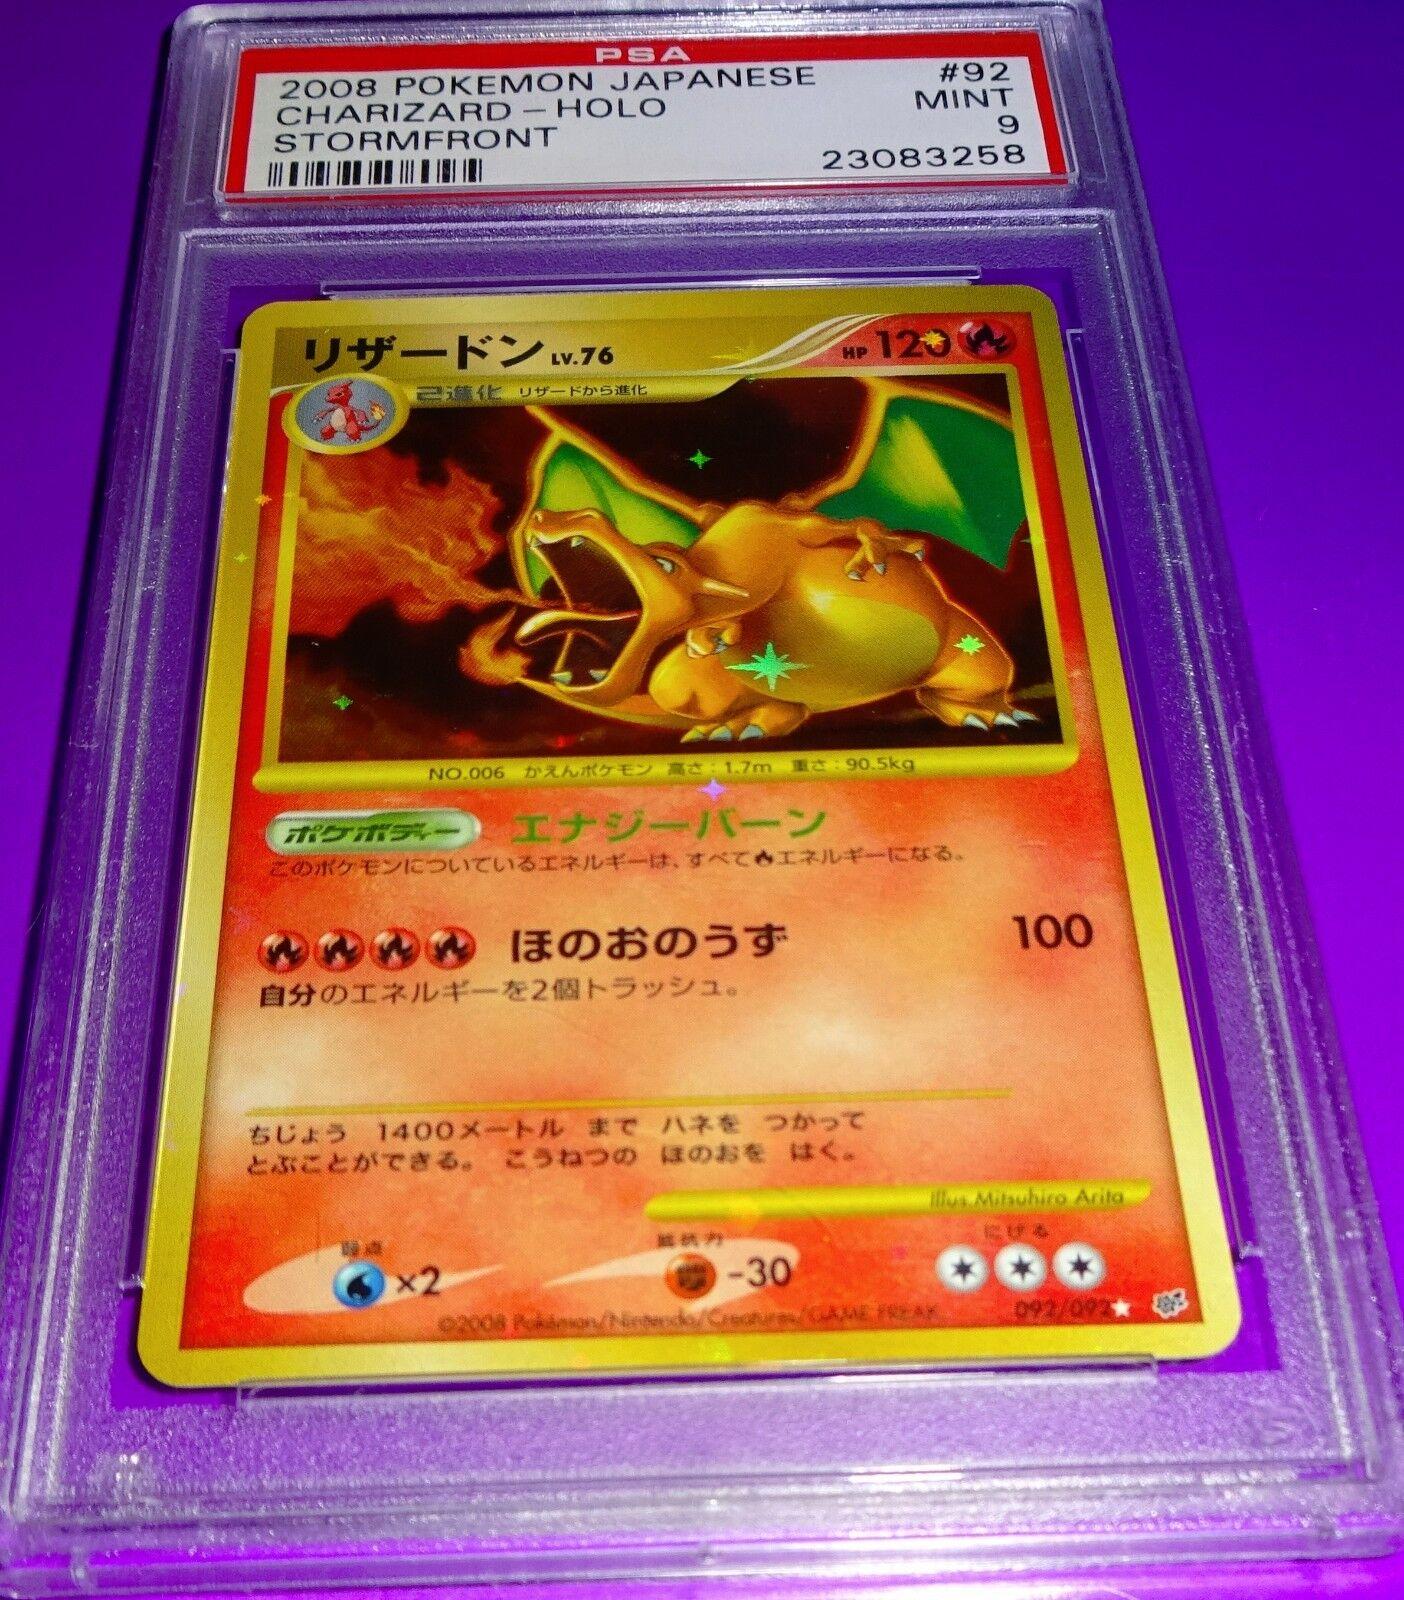 Pokemon Charizard Charizard Charizard Japanese Stormfront Holo  PSA 9 5ad13e